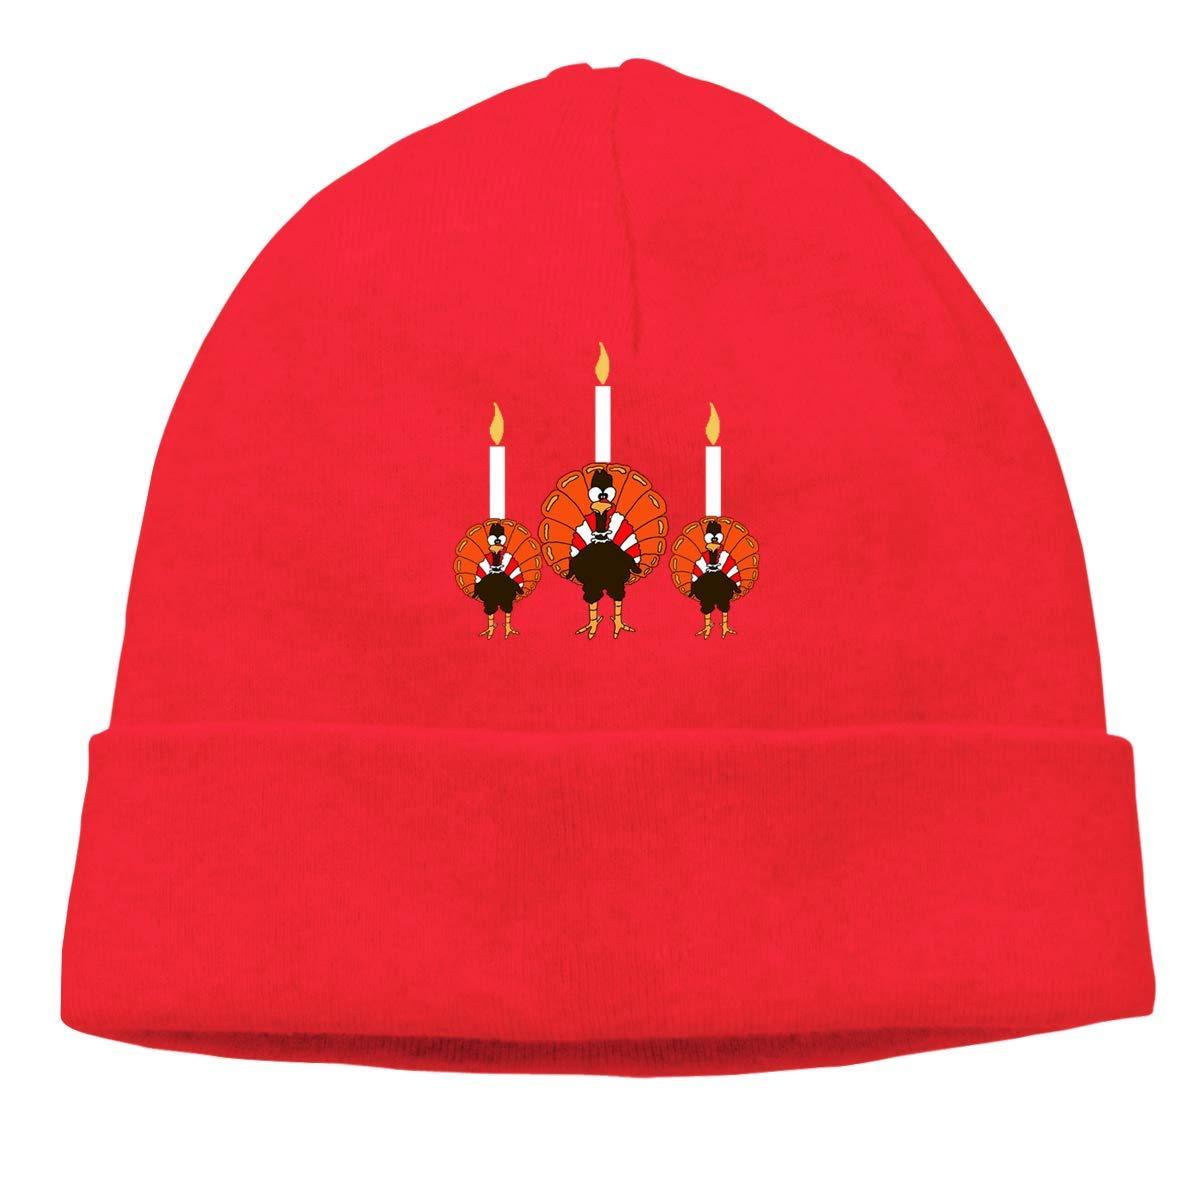 OQUYCZ Thanksgiving Turkey Candle Warm Stretchy Solid Daily Skull cap Knit Wool Beanie Hat Outdoor Winter Fashion Warm Beanie Hat